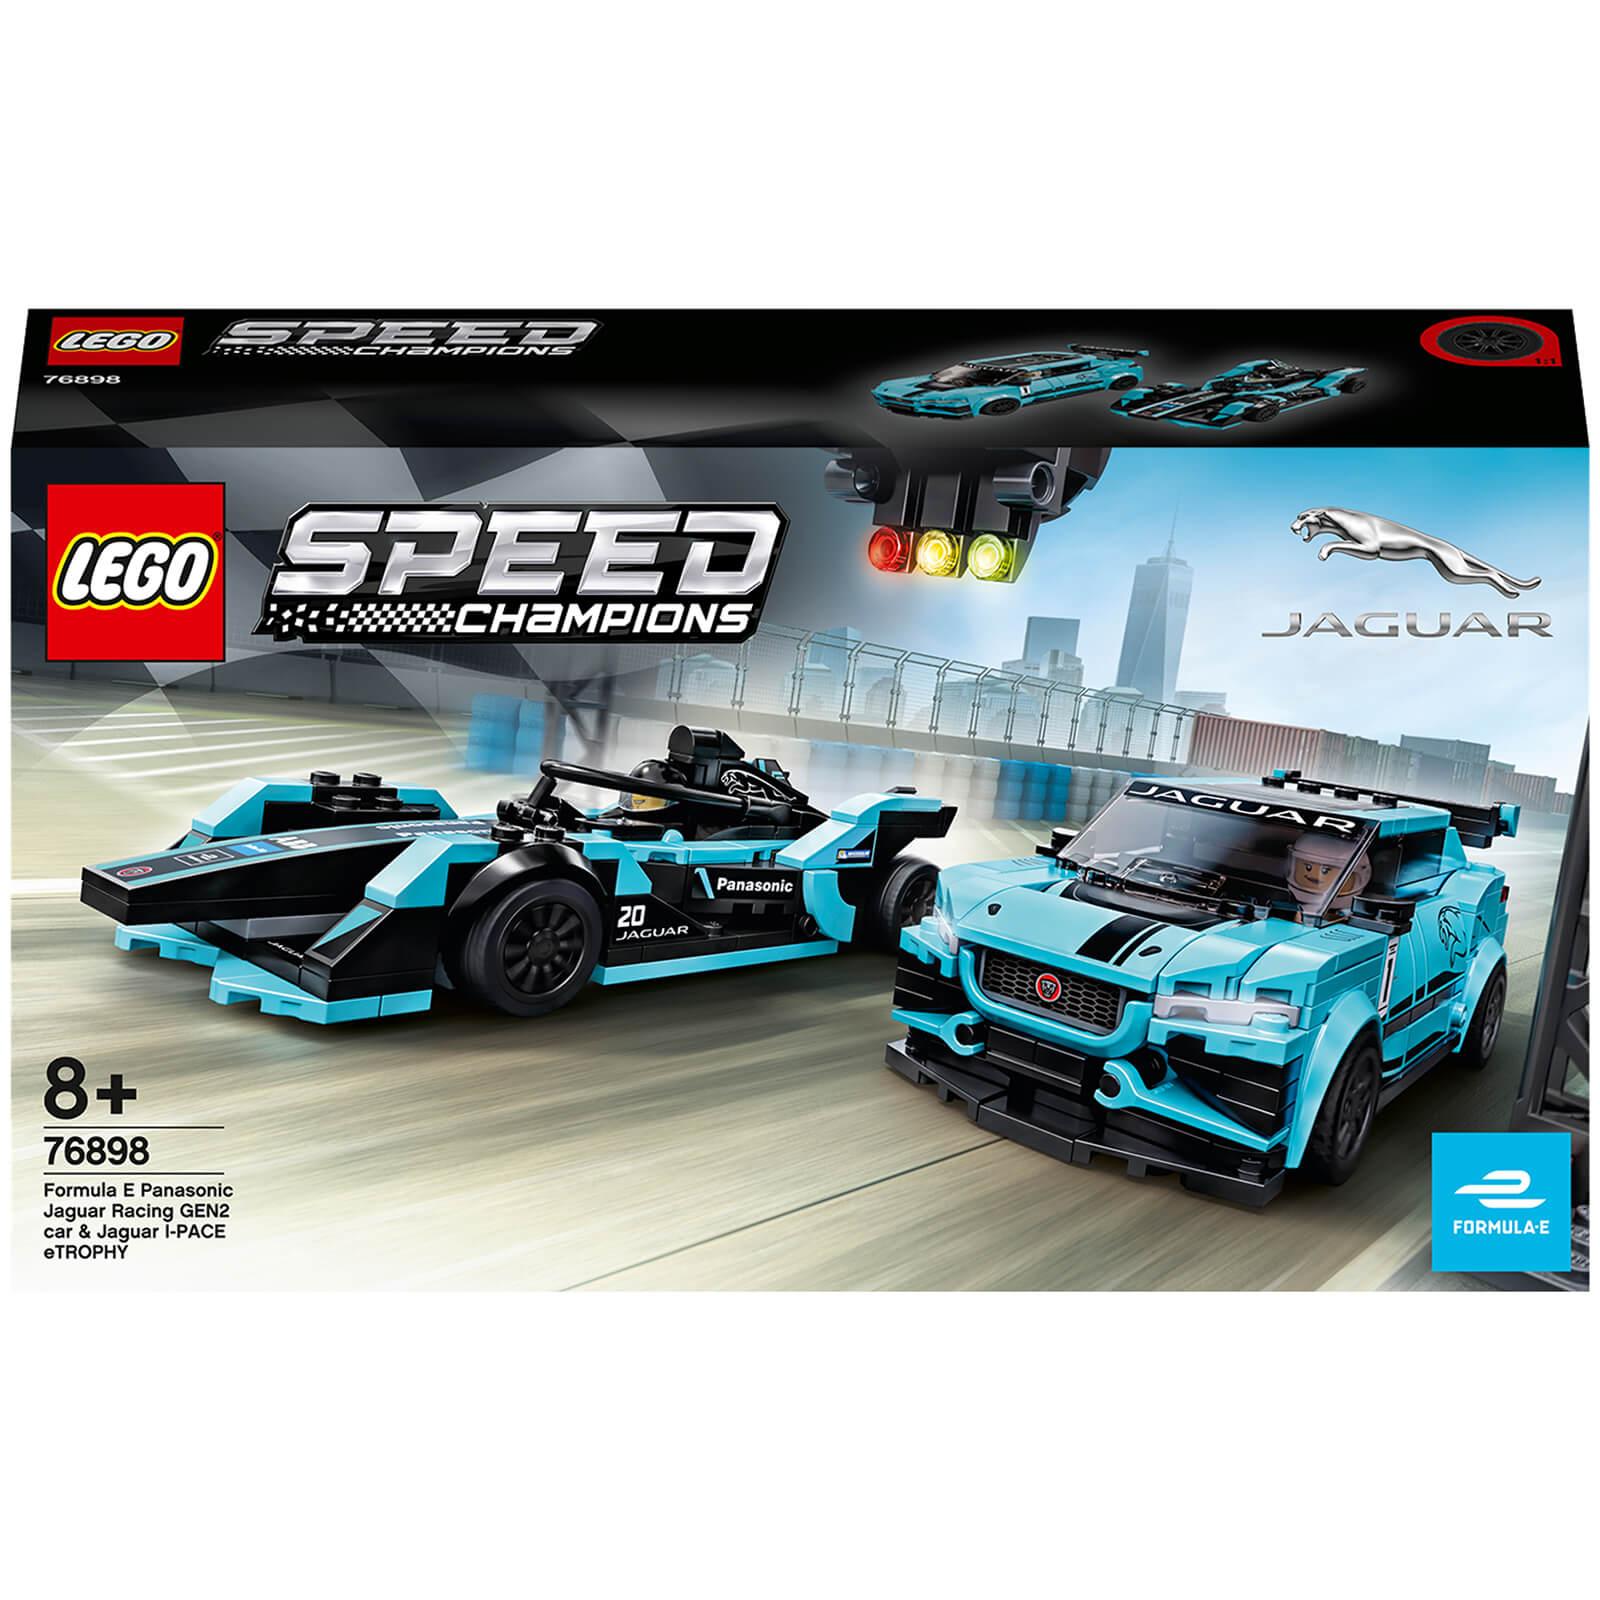 Image of 76898 LEGO® SPEED CHAMPIONS Formula E Panasonic Jaguar Racing GEN2 car & Jaguar I-PACE eTROPHY